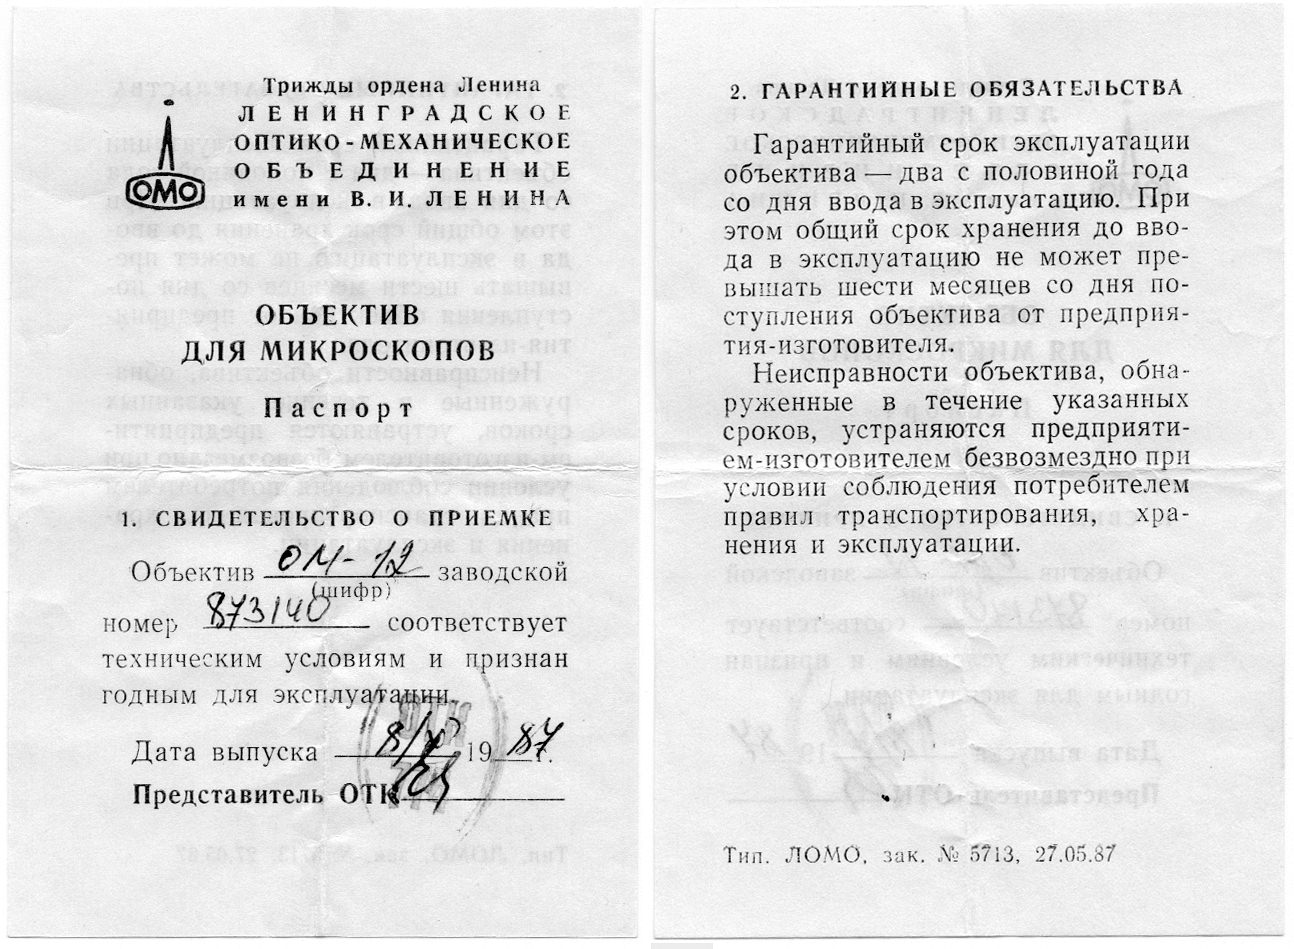 Lomo-3,7-passport.jpg